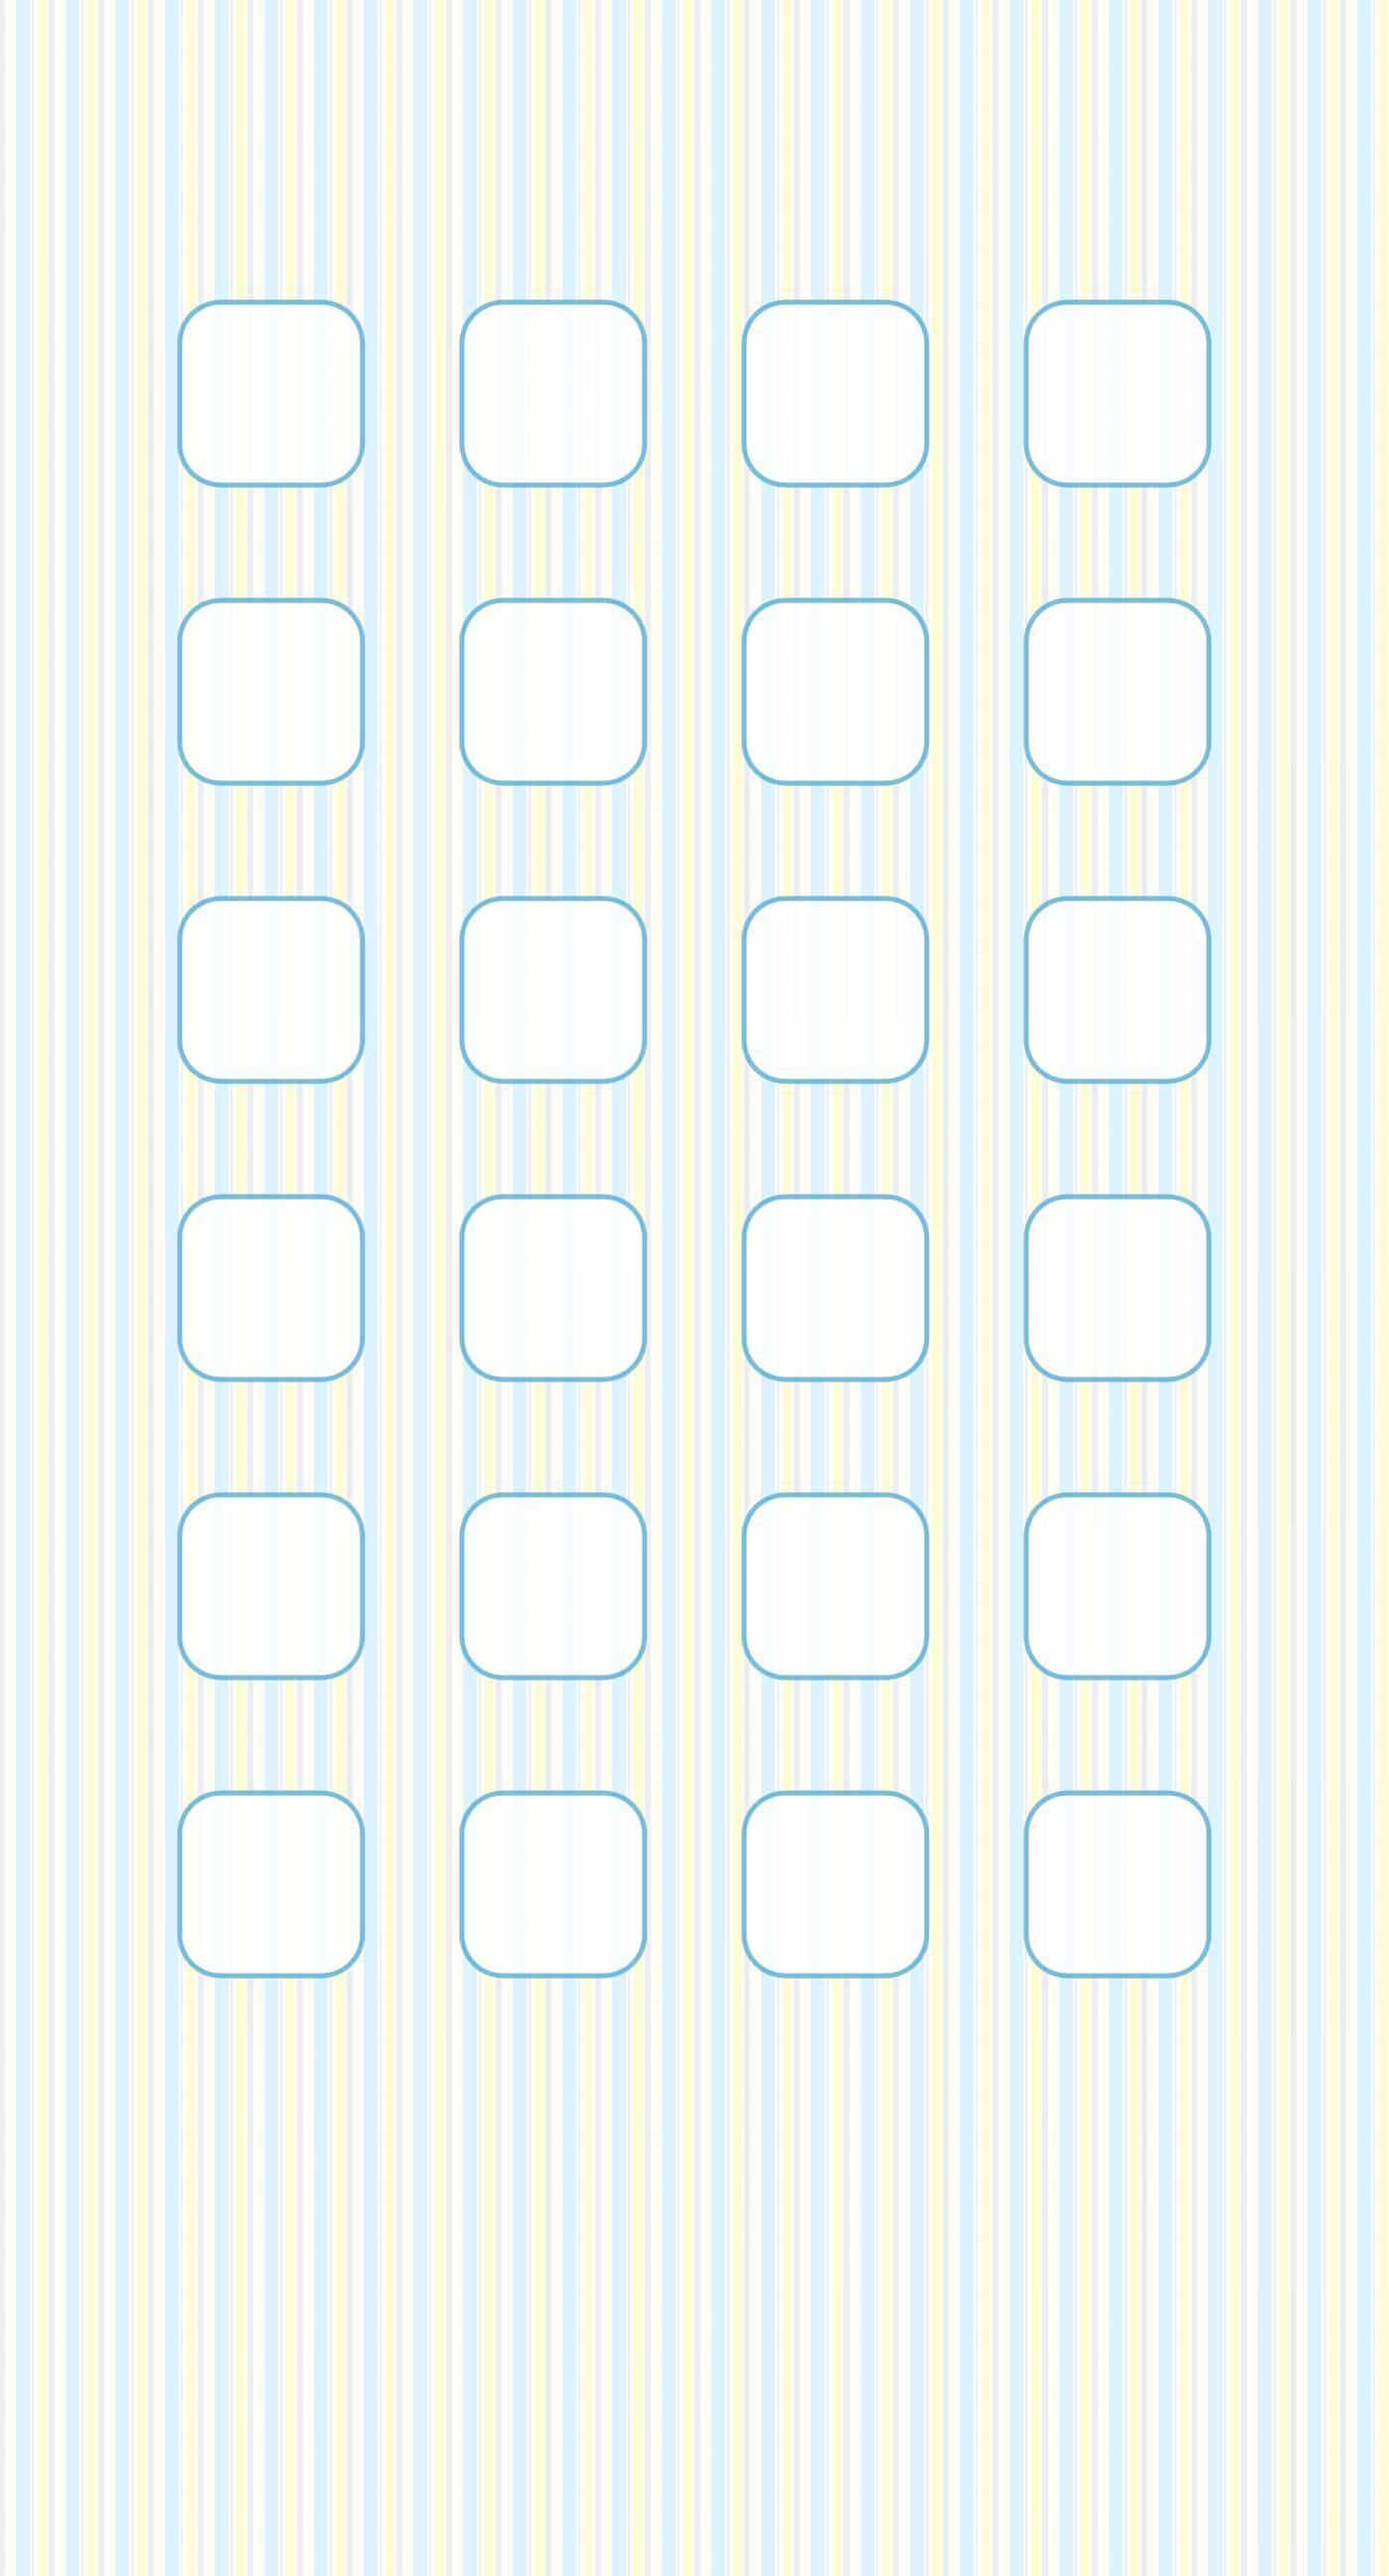 iPhone 7 Plus wallpaper